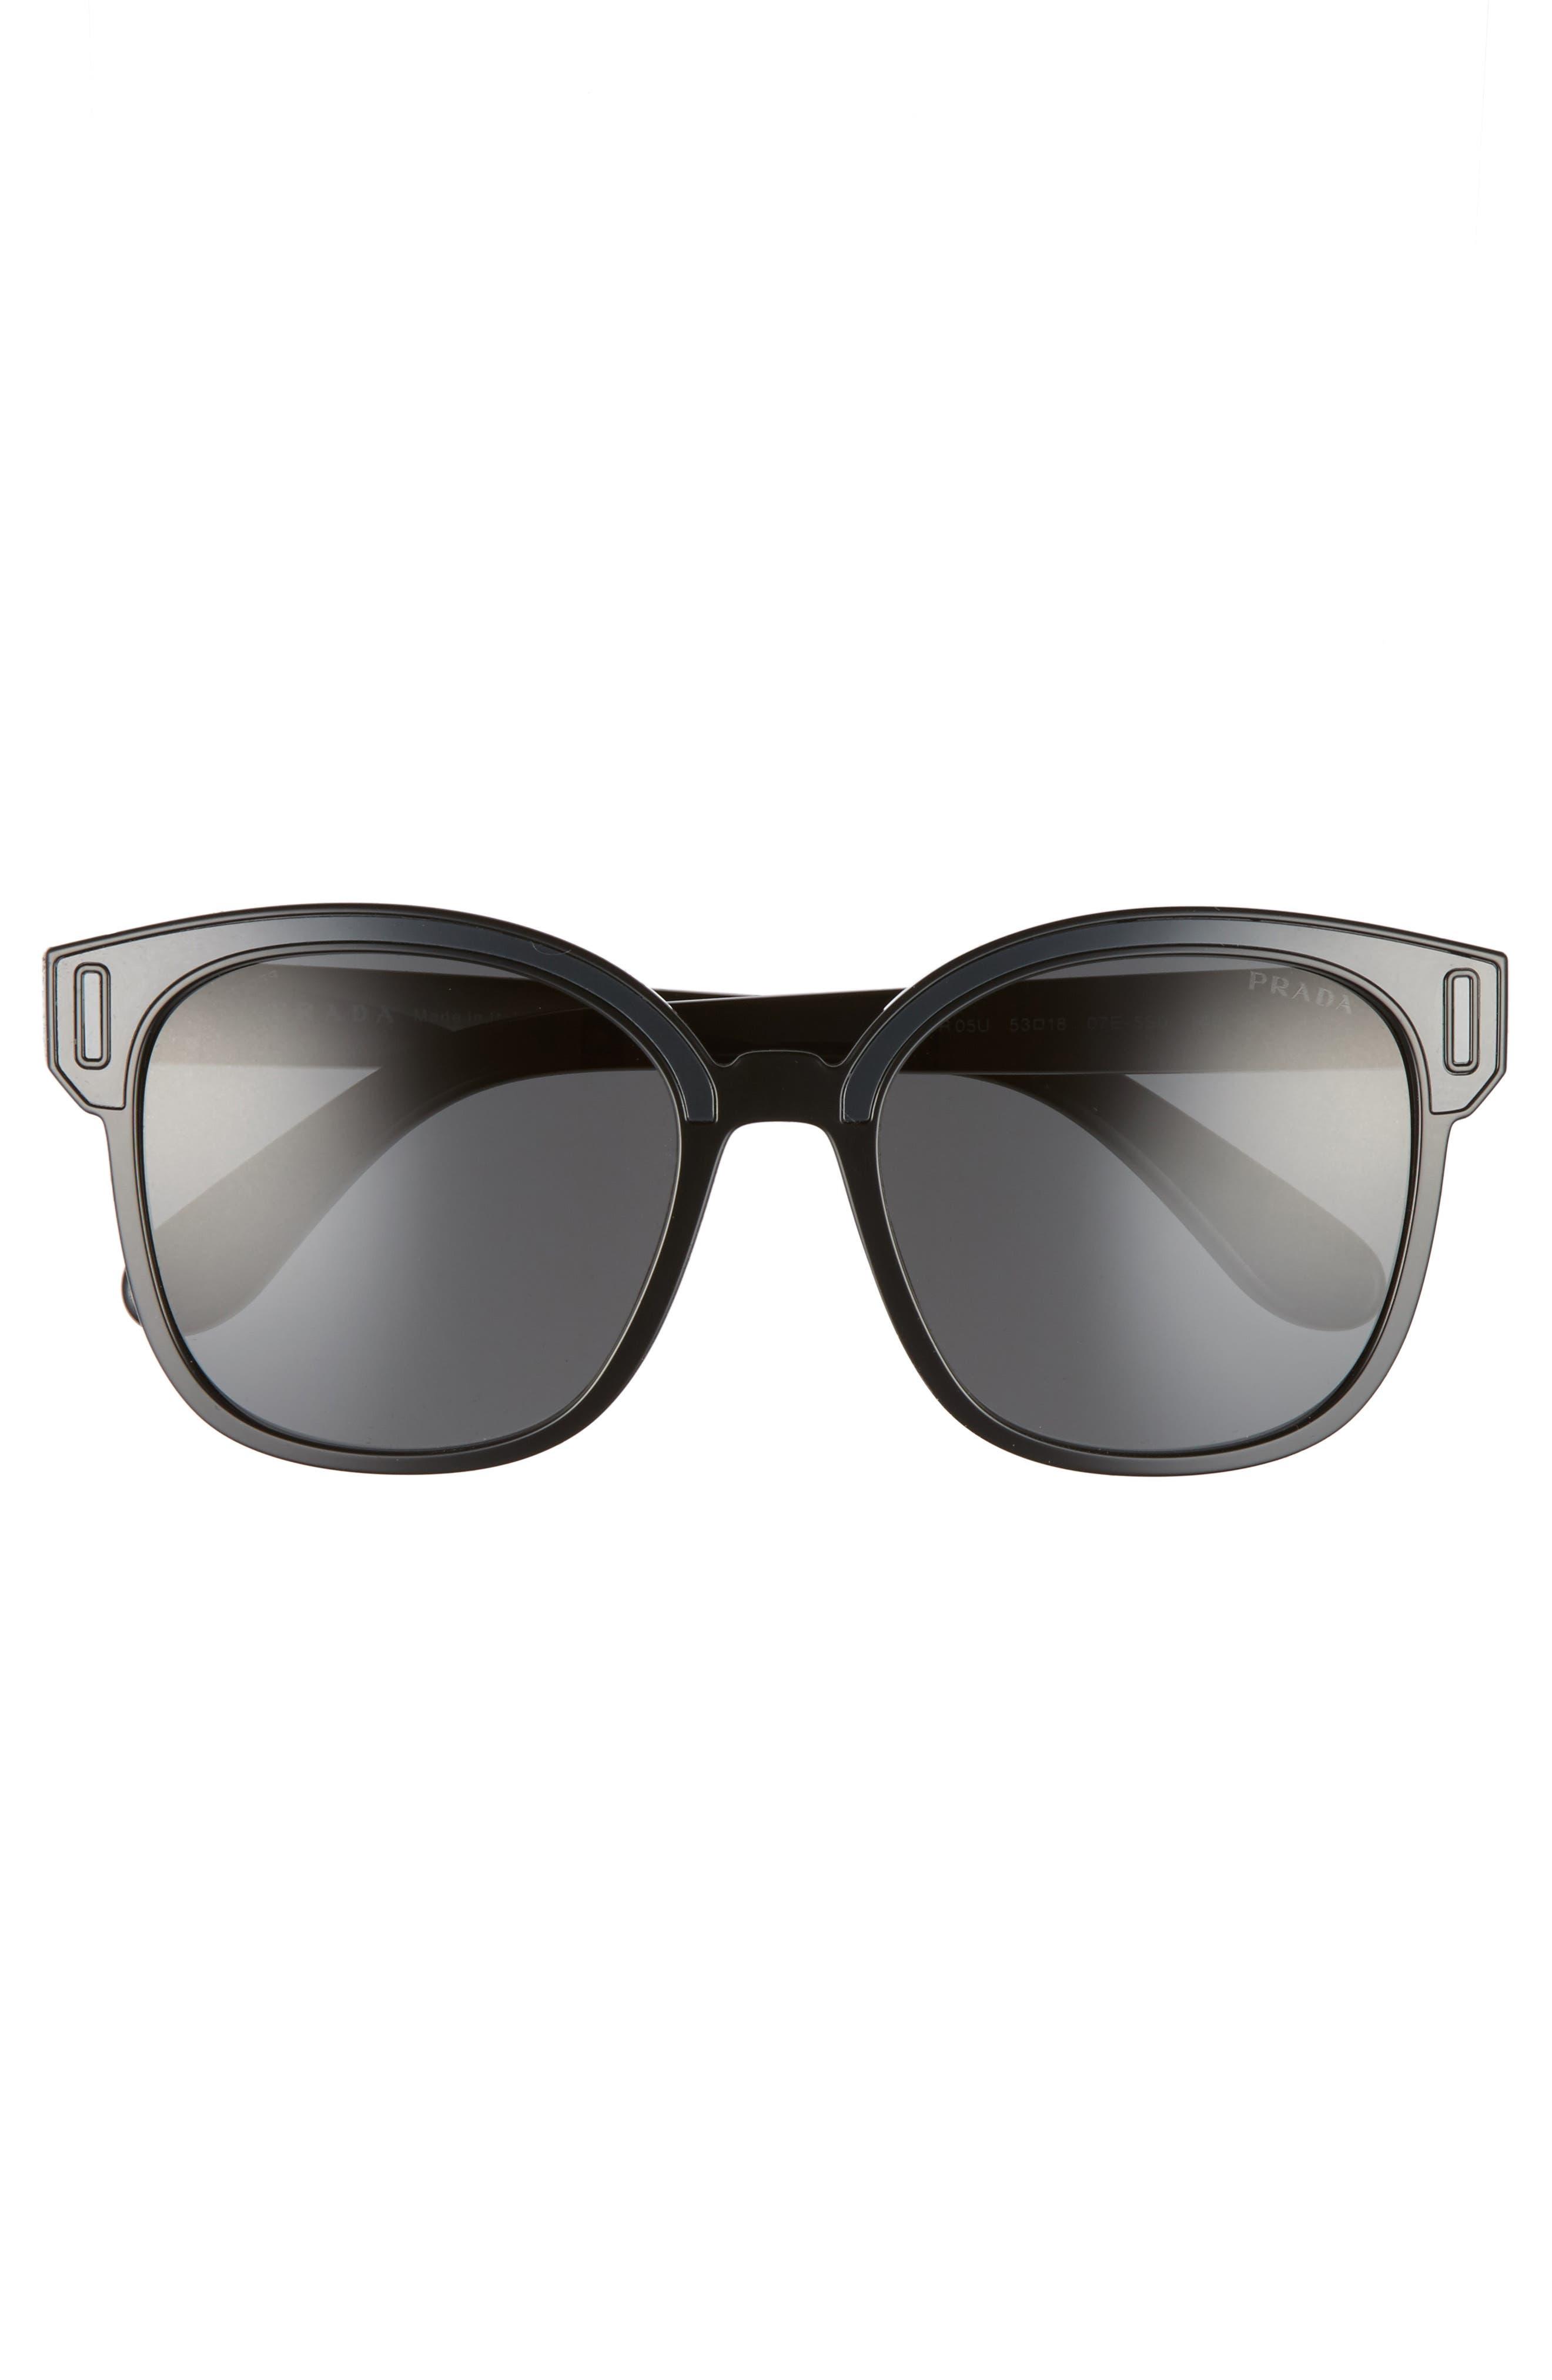 53mm Colorblock Square Sunglasses,                             Alternate thumbnail 3, color,                             022